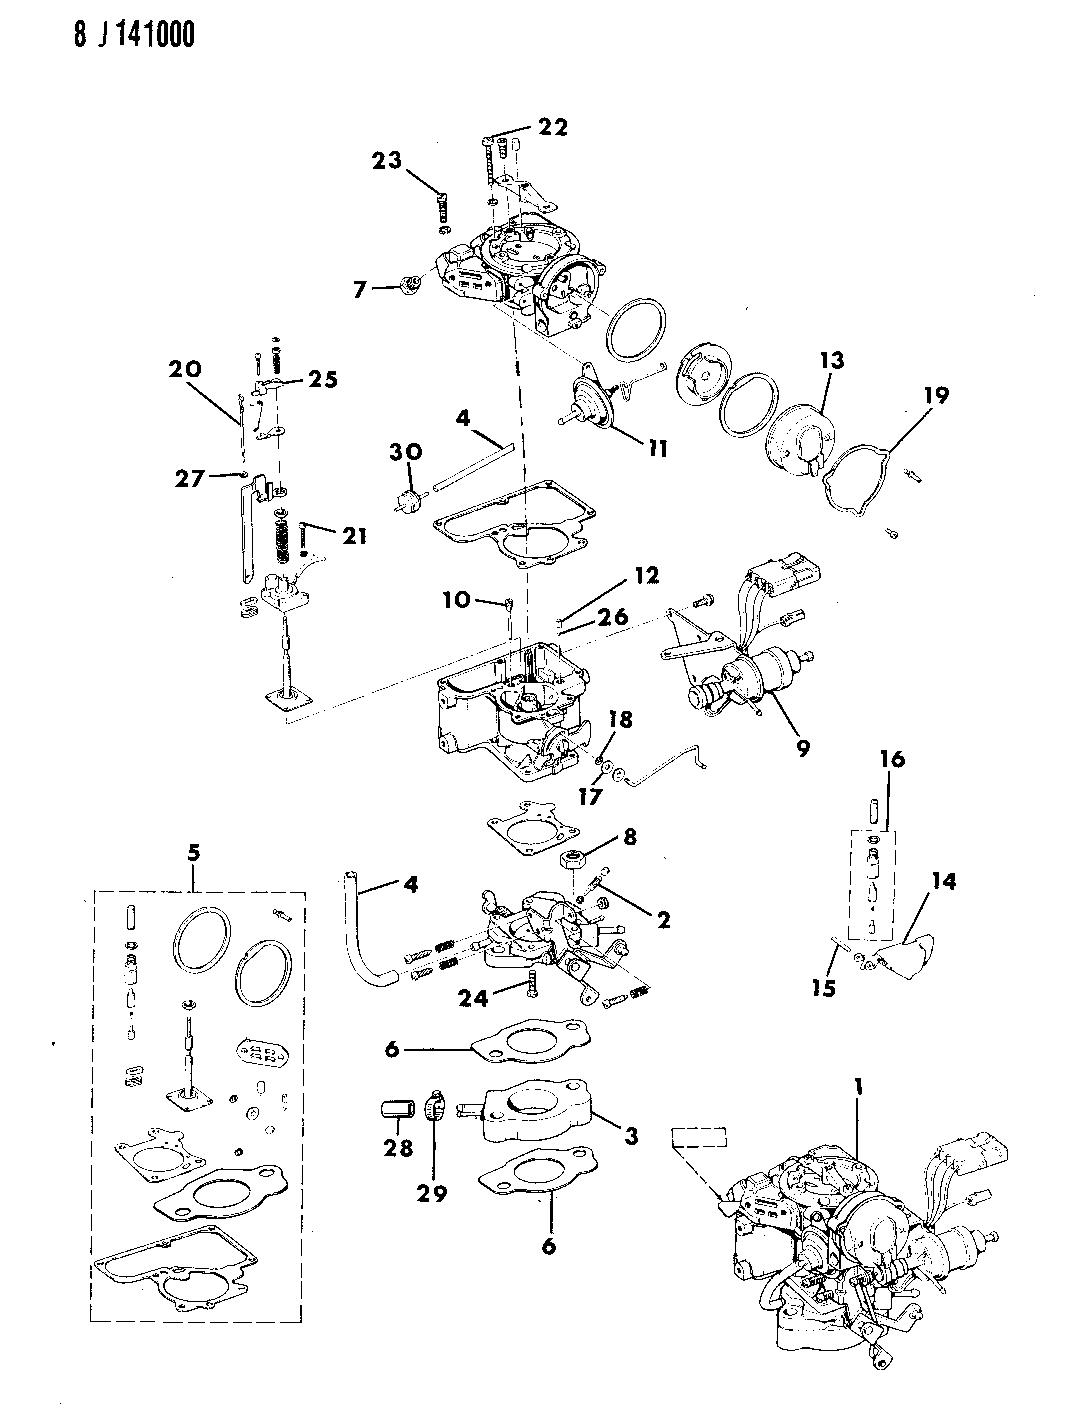 1987 Jeep Comanche Carburetor & Component Parts